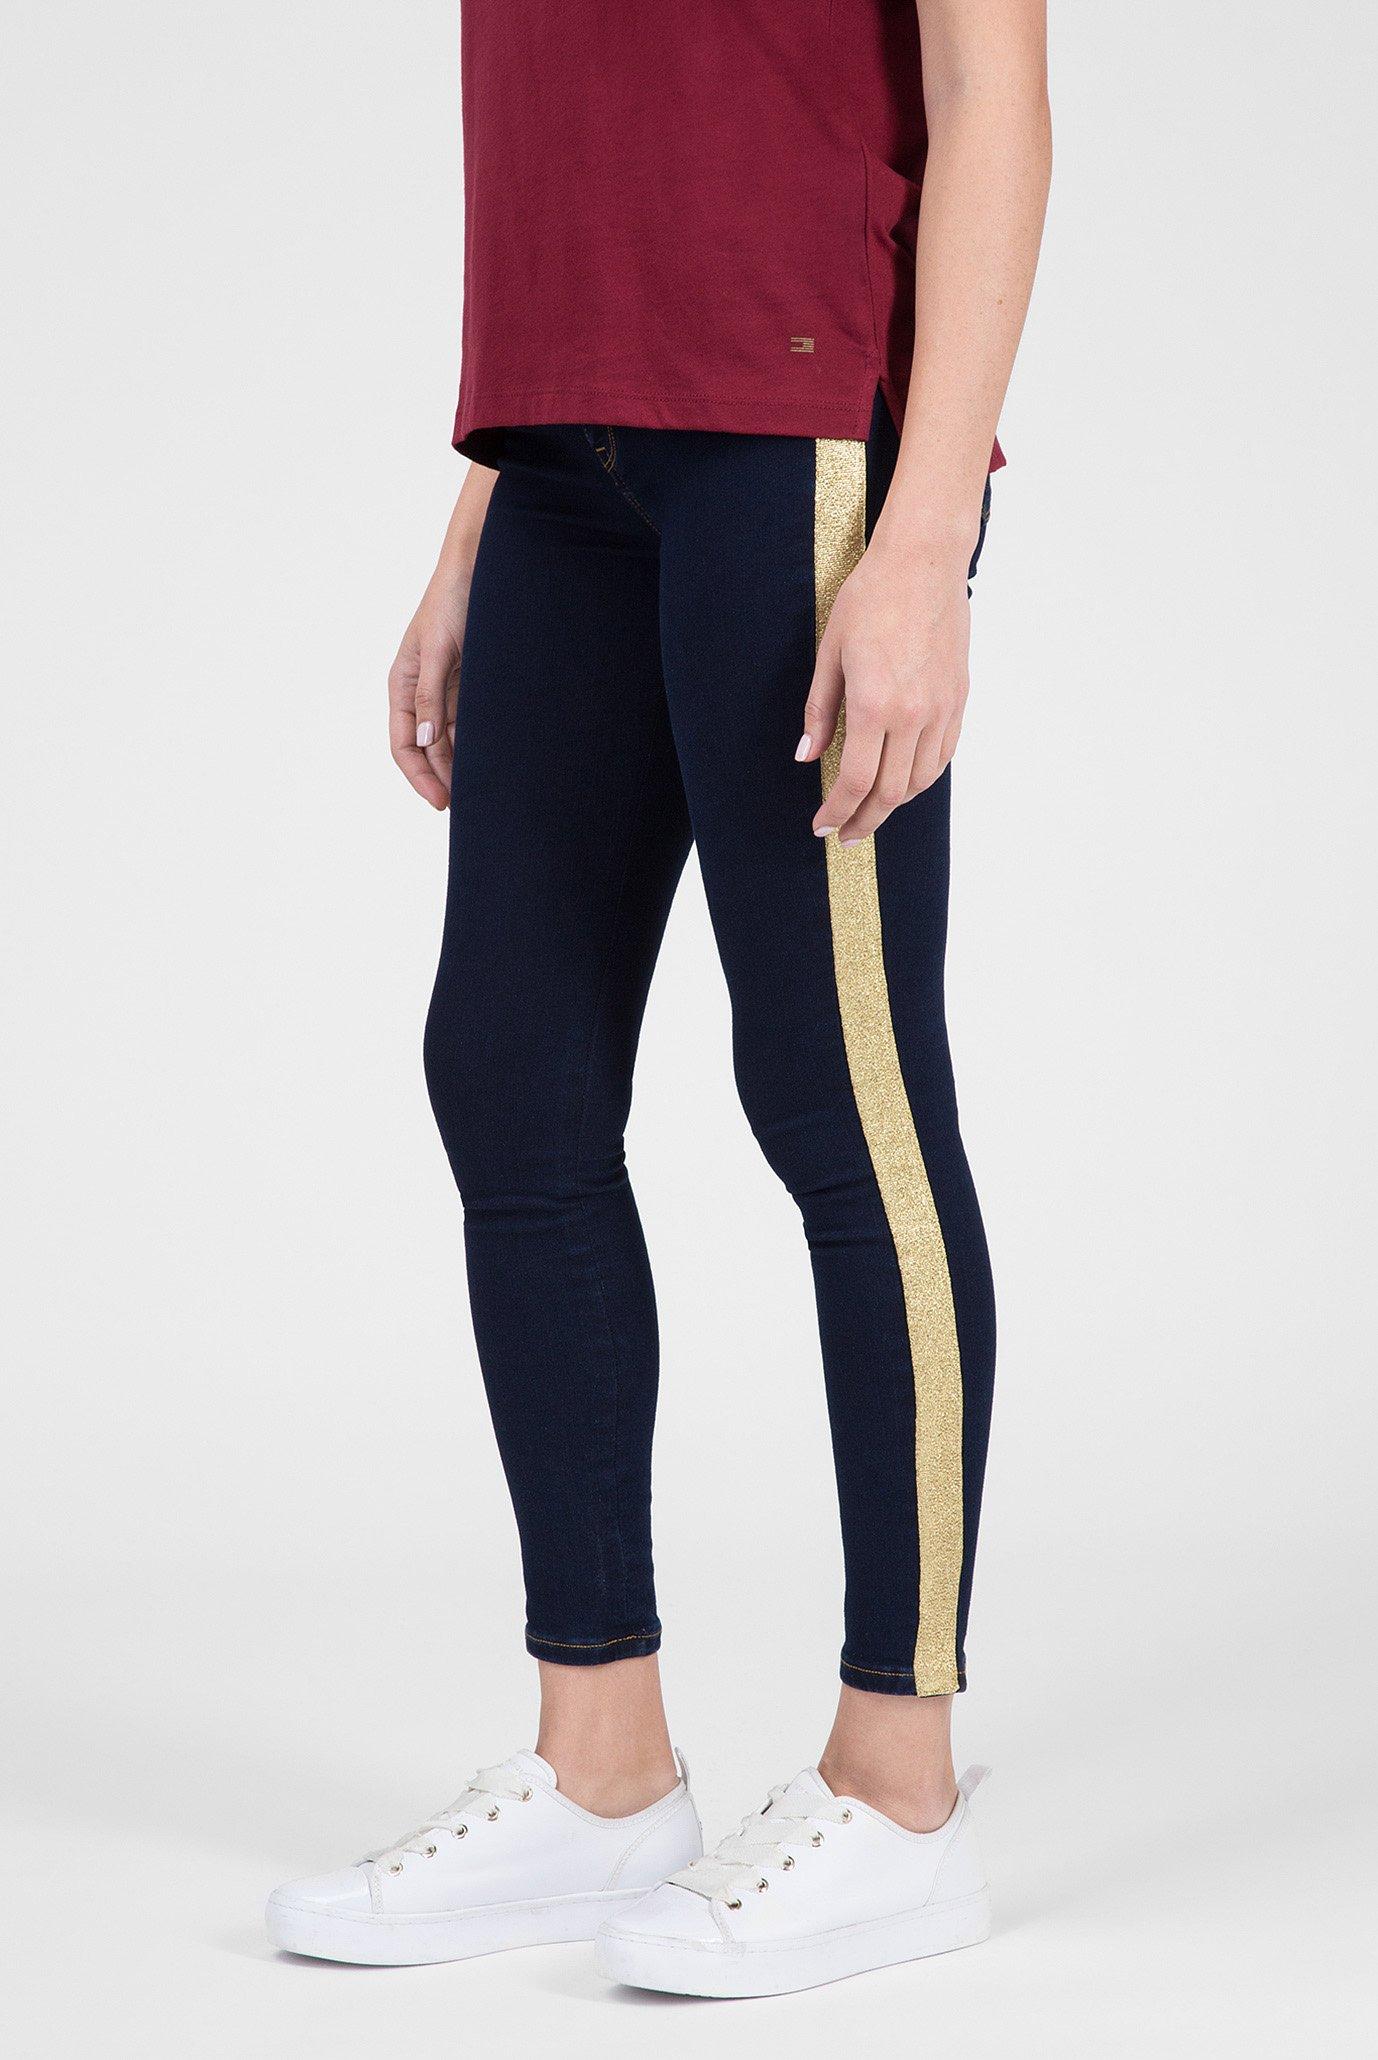 Купить Женские темно-синие джинсы ICON COMO RW ANKLE AGATHA Tommy Hilfiger Tommy Hilfiger WW0WW23721 – Киев, Украина. Цены в интернет магазине MD Fashion